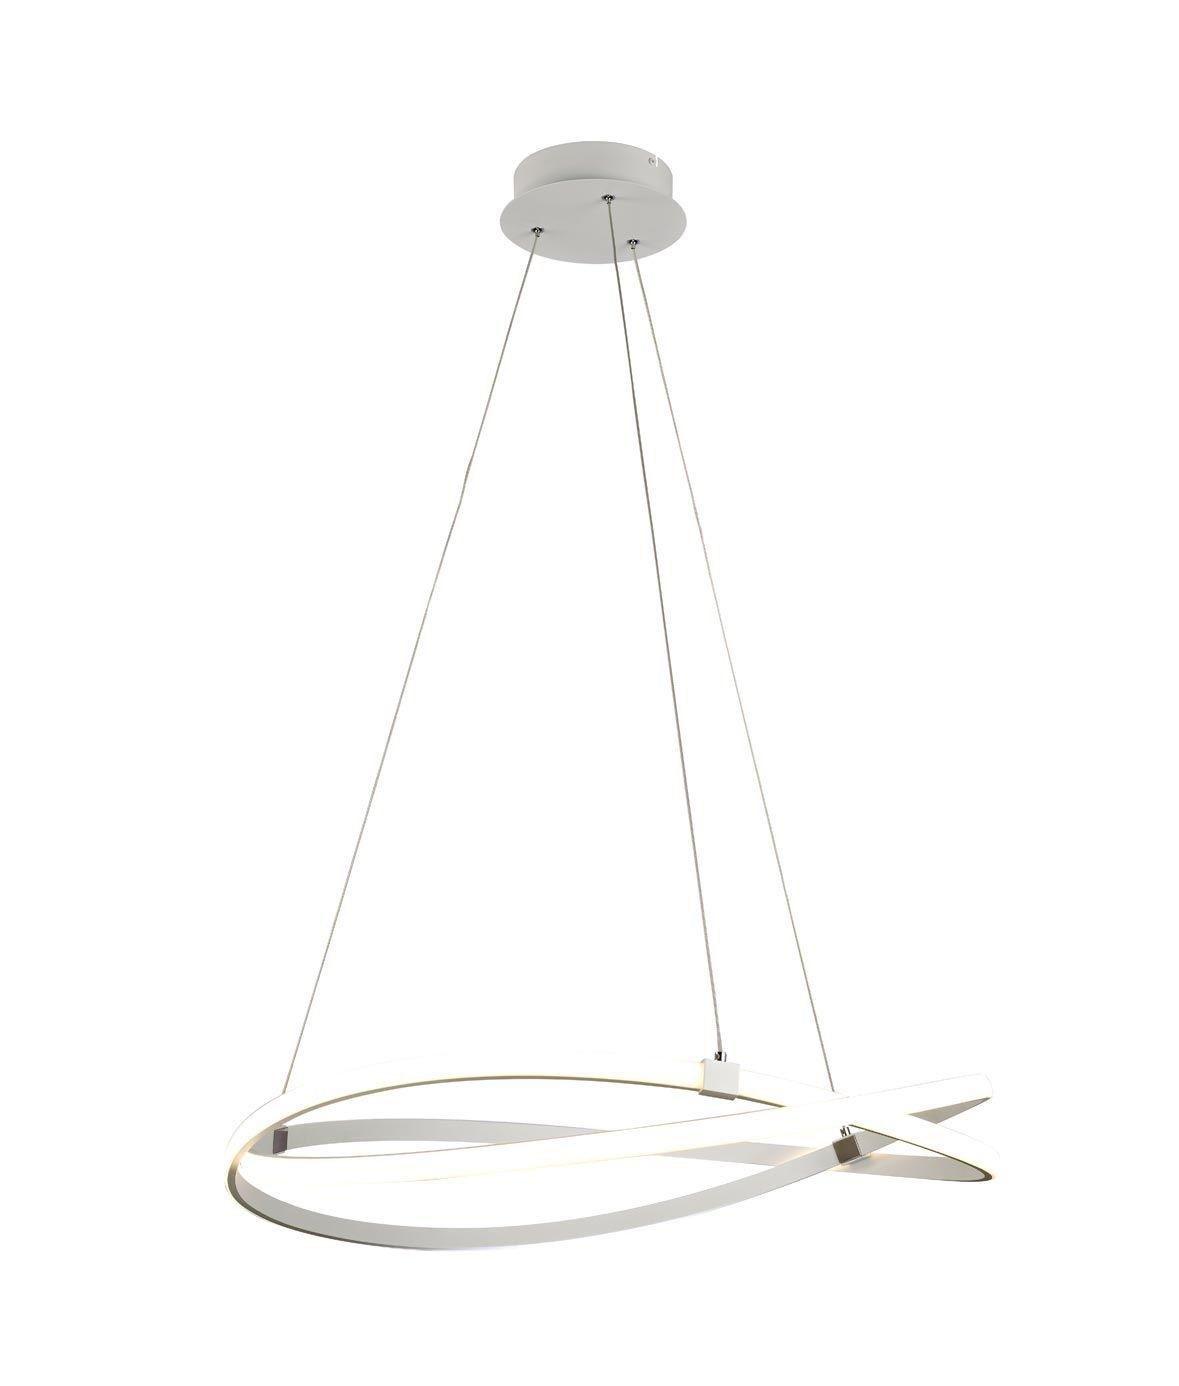 Lámparas dimmable INFINITY blanca